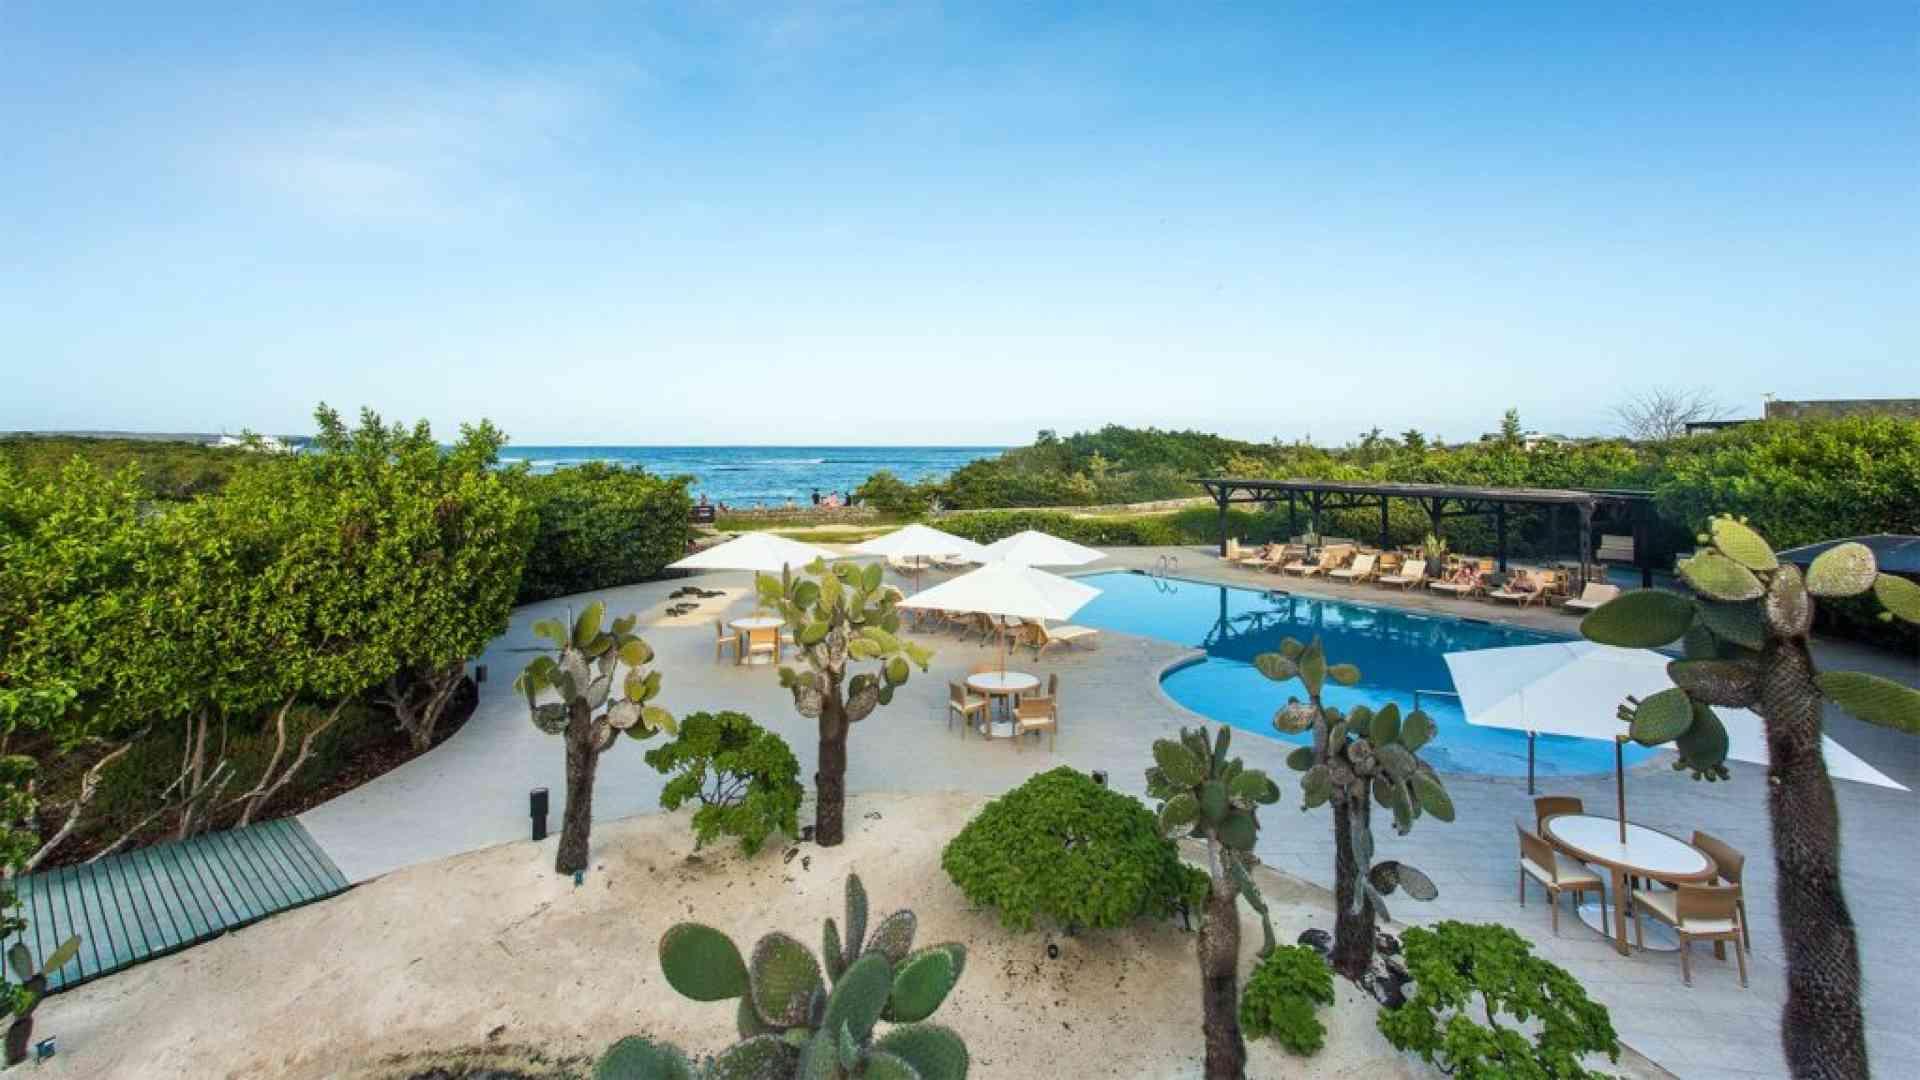 Finch Bay Eco Resort - Oceanfront views, Galapagos, Ecuador